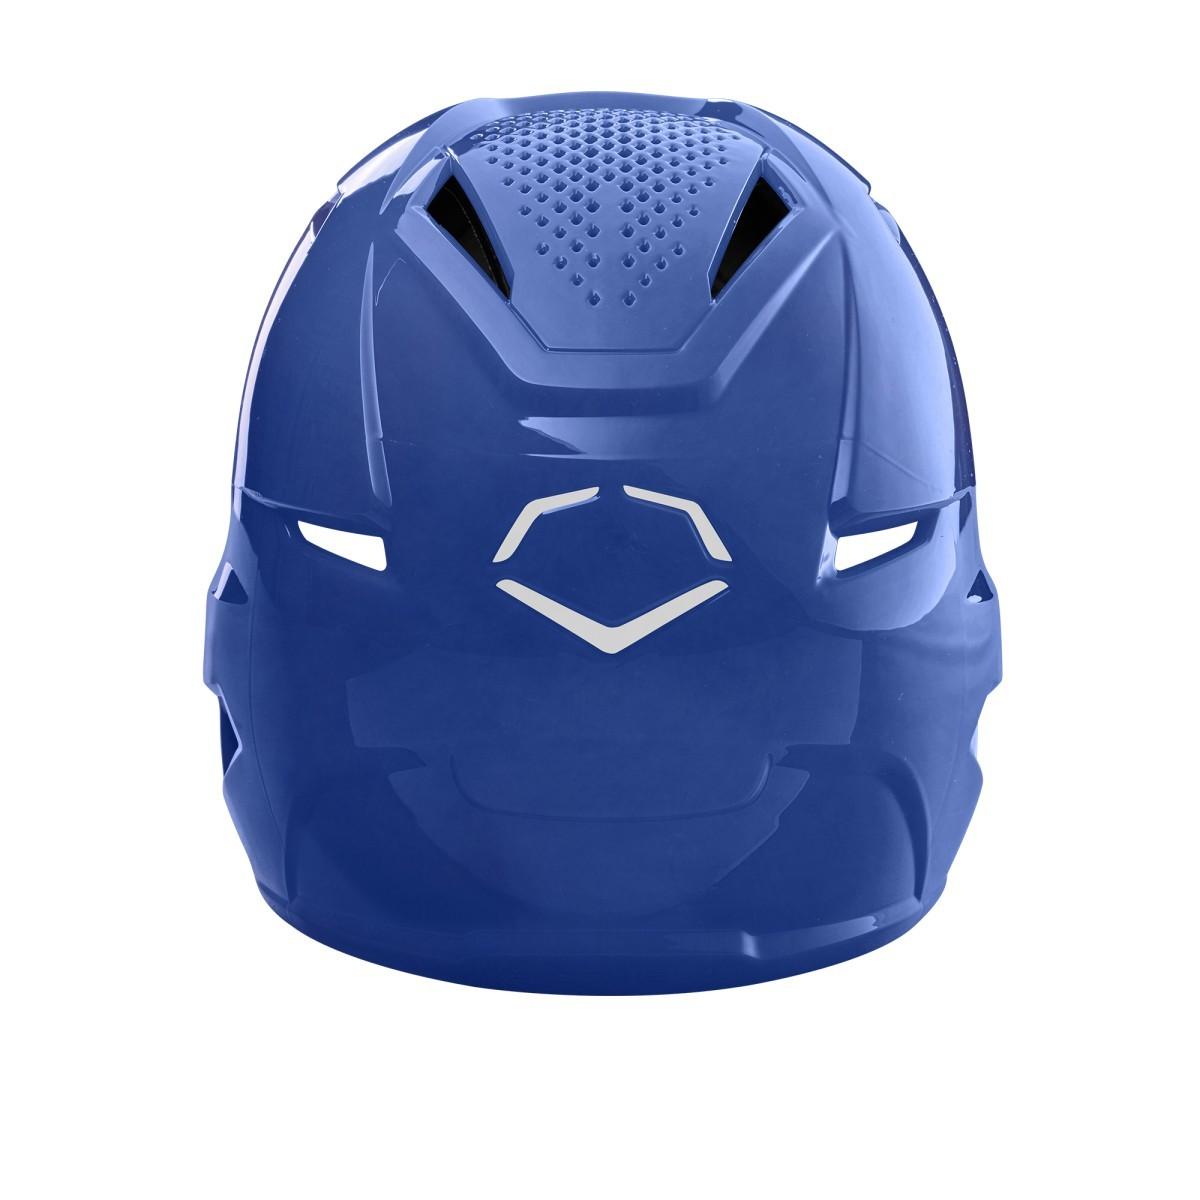 EVOSHIELD  XVT BATTING HELMET HIGH GLOSS FINISH - NAVY BLUE